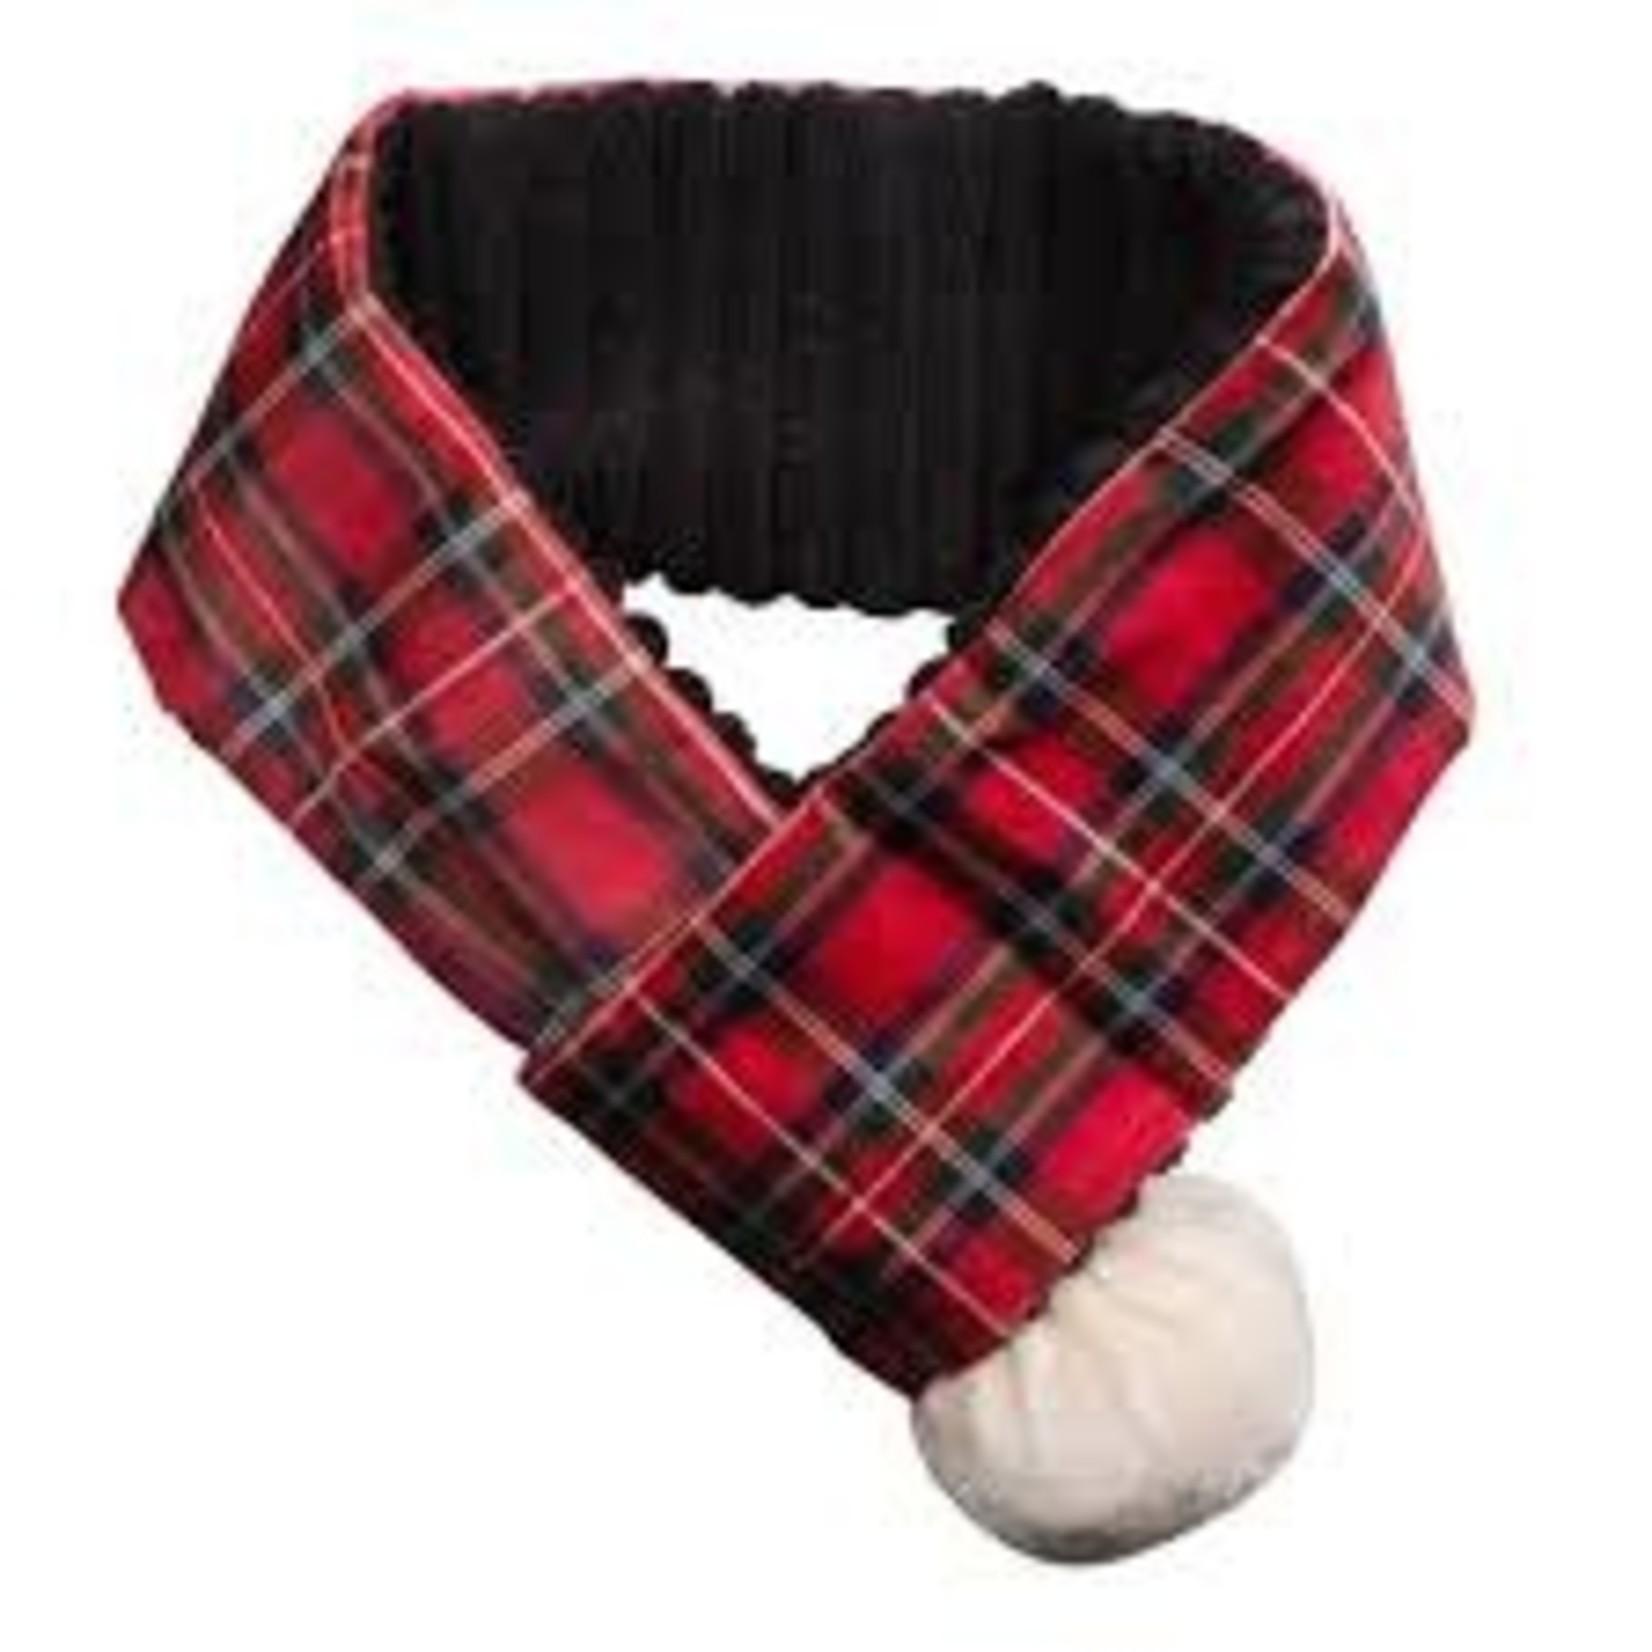 HuggleHounds HuggleHounds Christmas Tartan Scarf Large